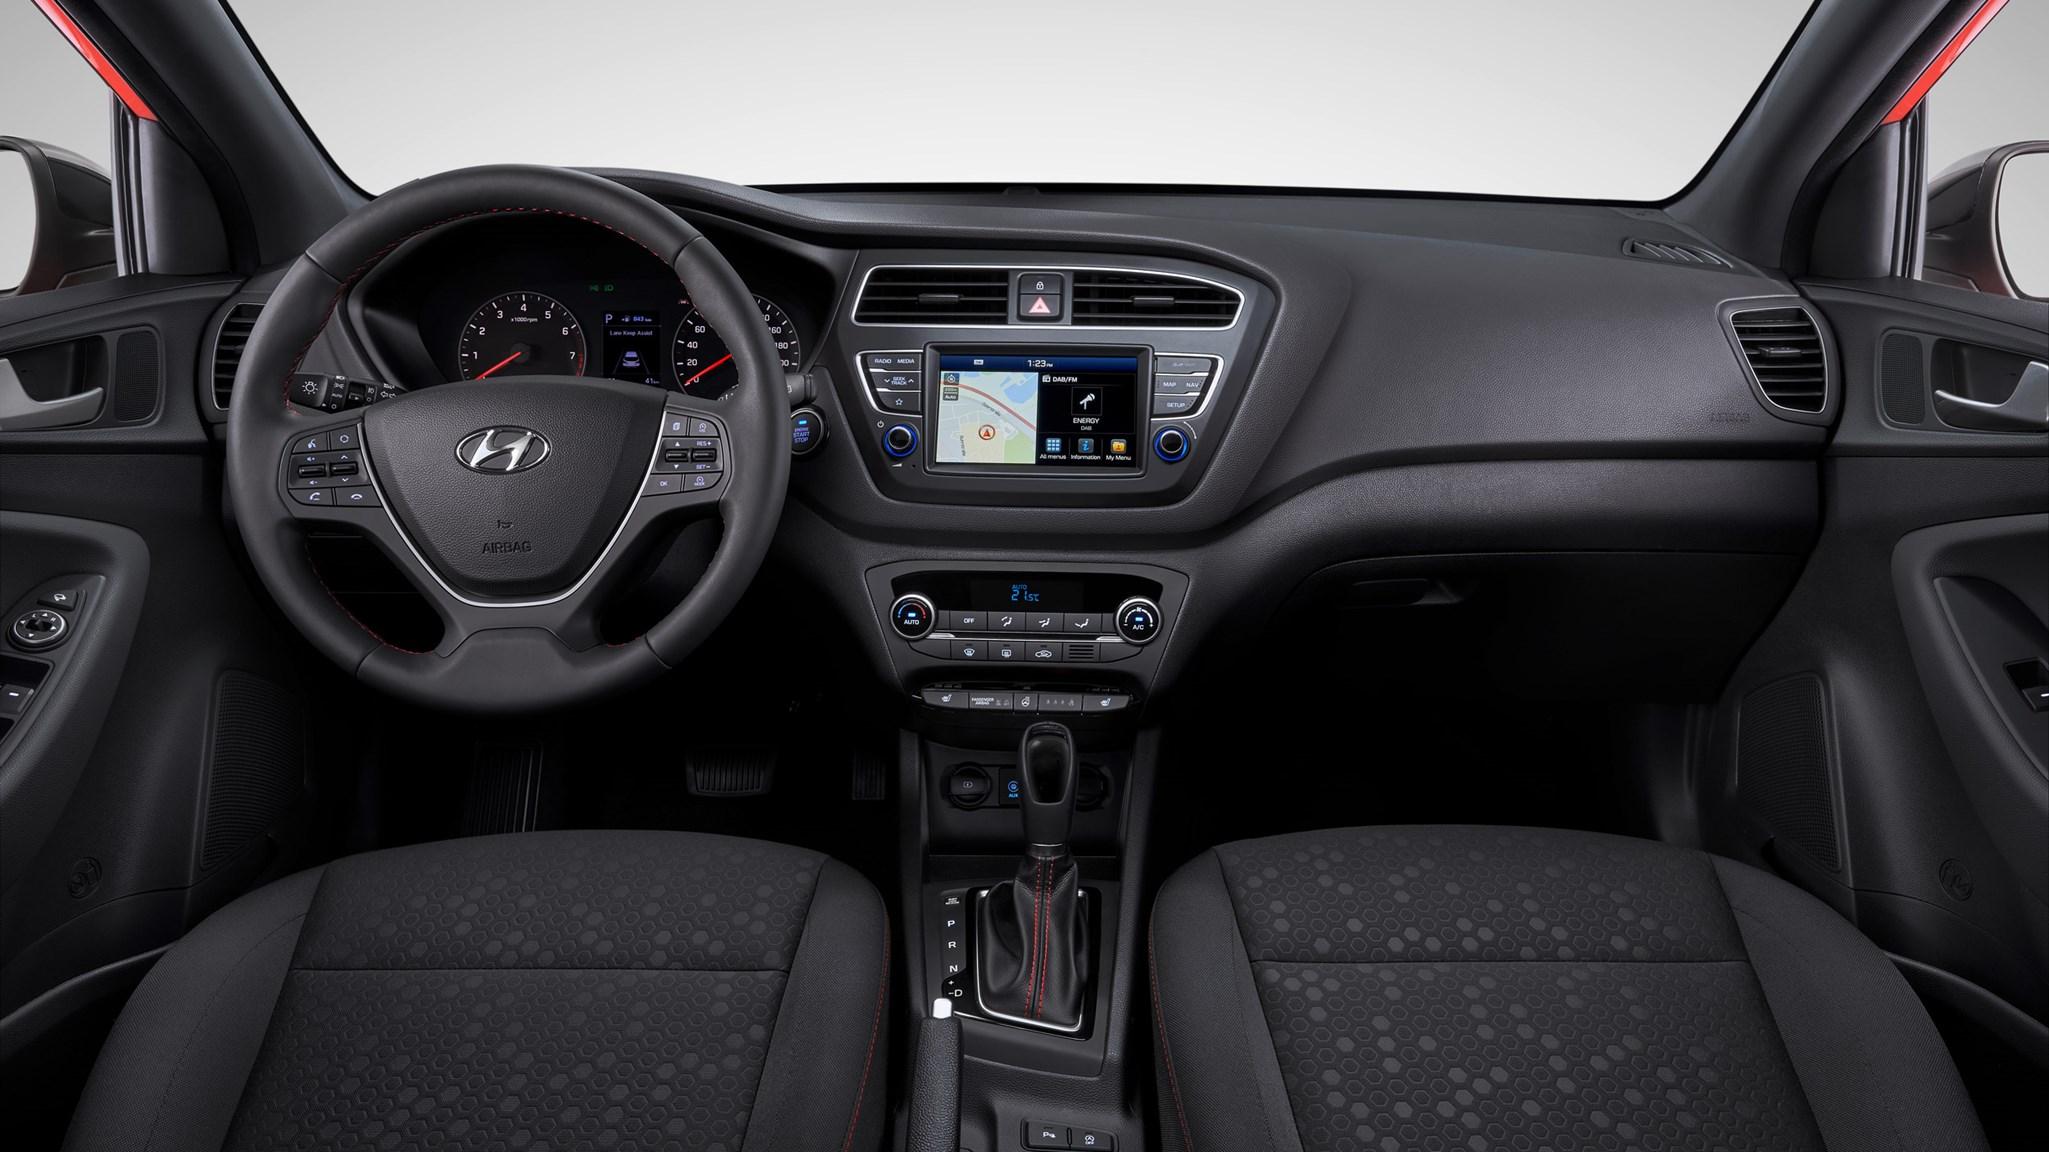 New Hyundai I20 B Segment Hatch Gets Updated Styling And Safety Tech Car Magazine